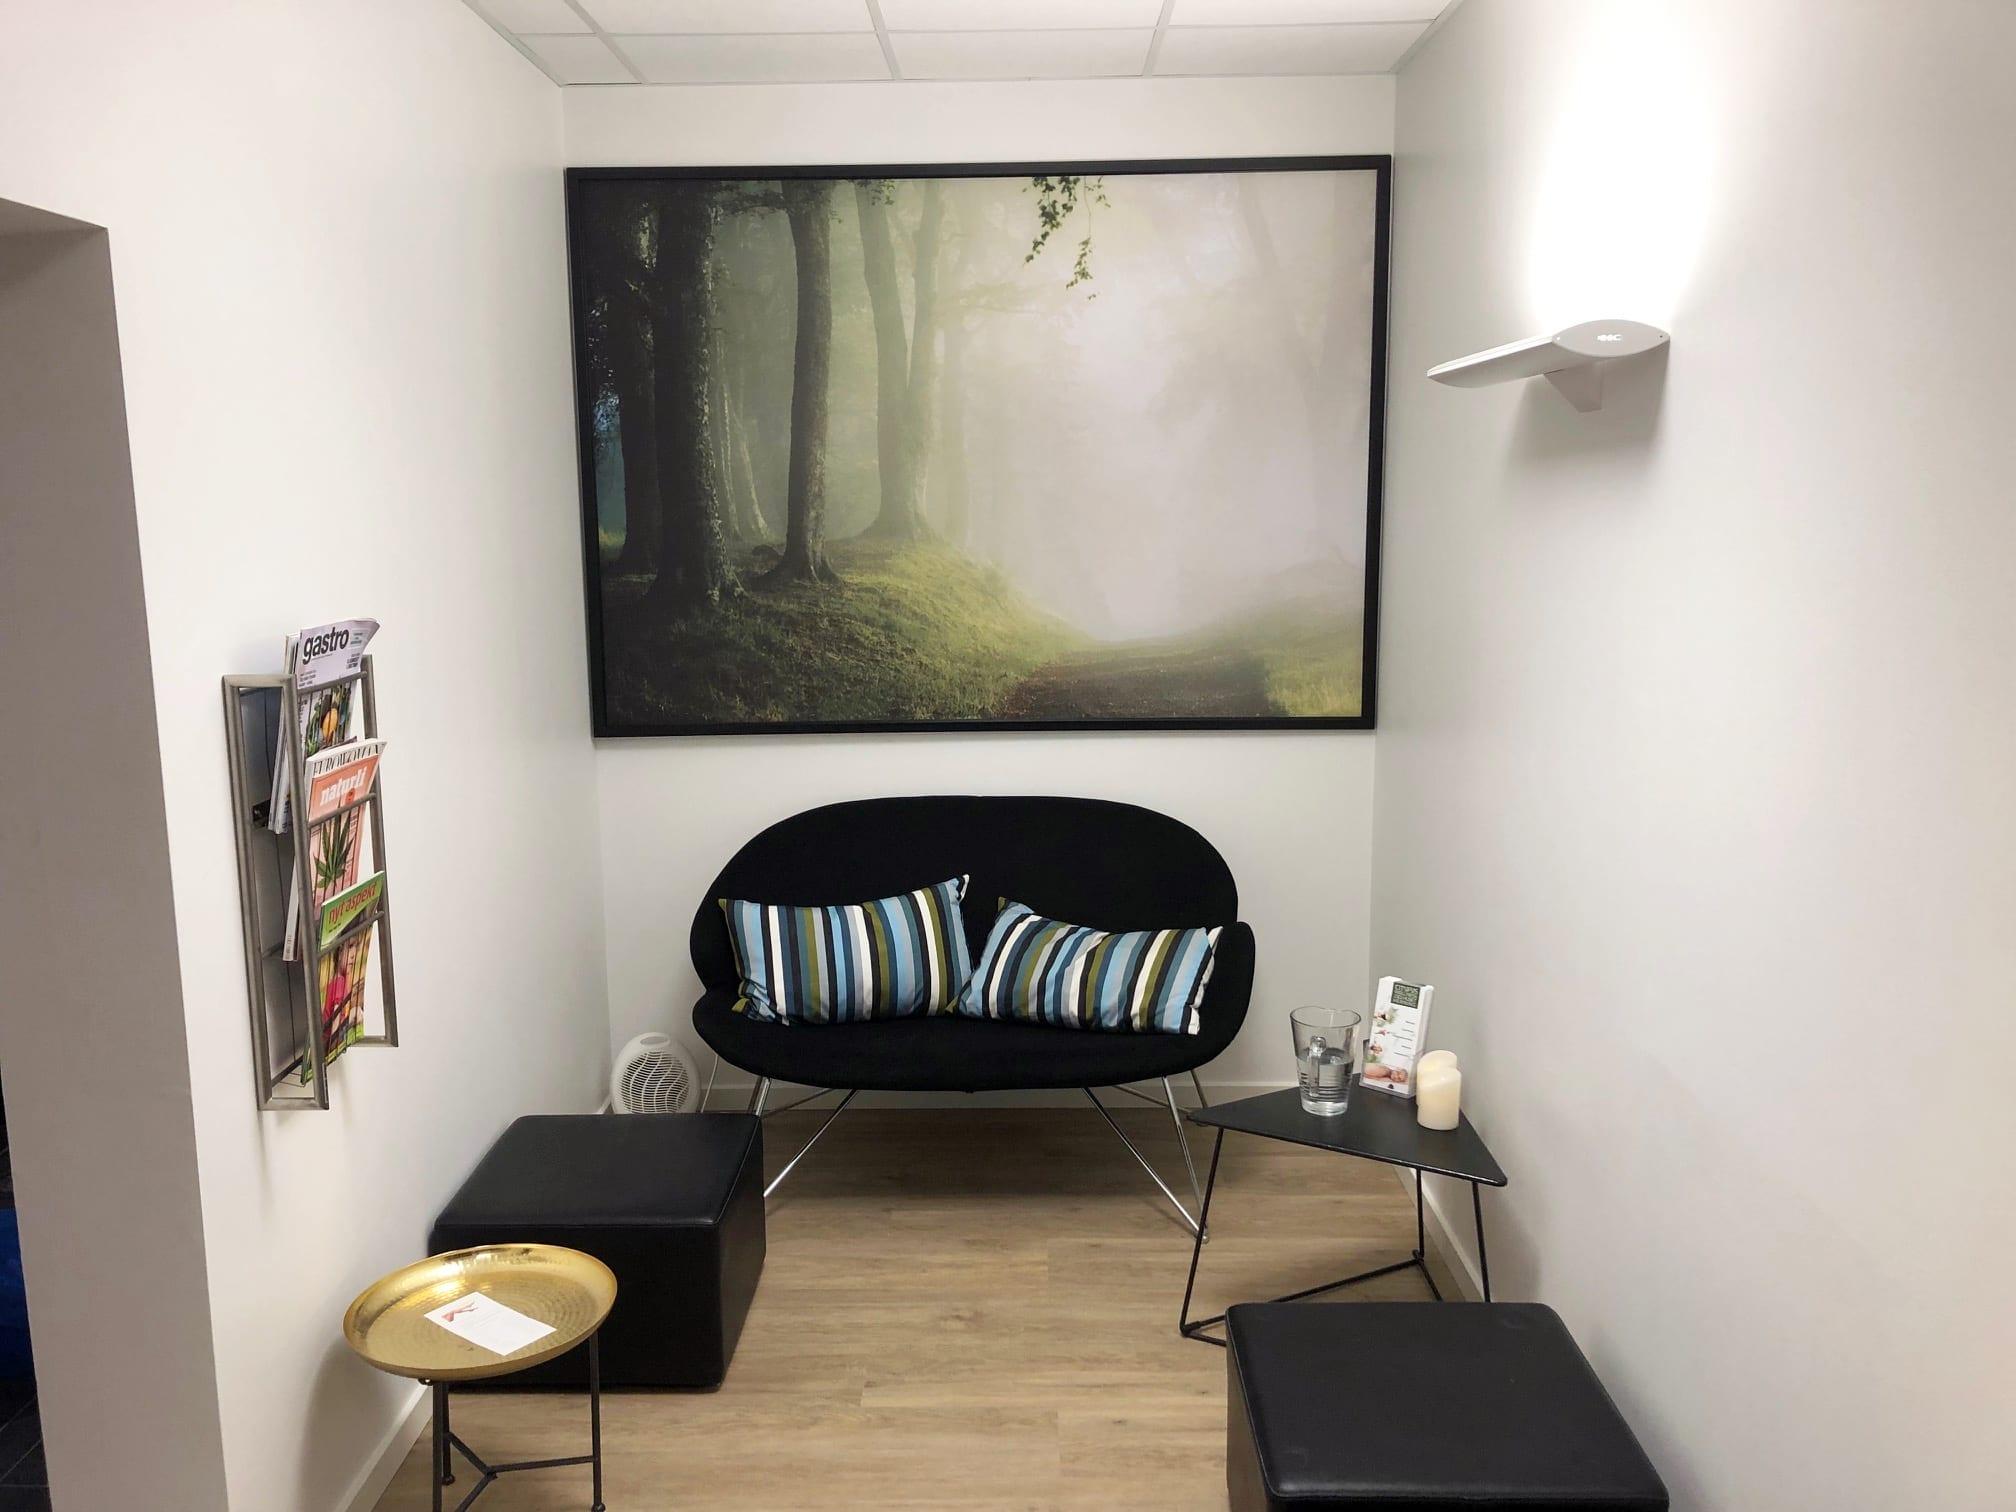 Venteværelset i CityFys Wellness i DGI Huset Herning